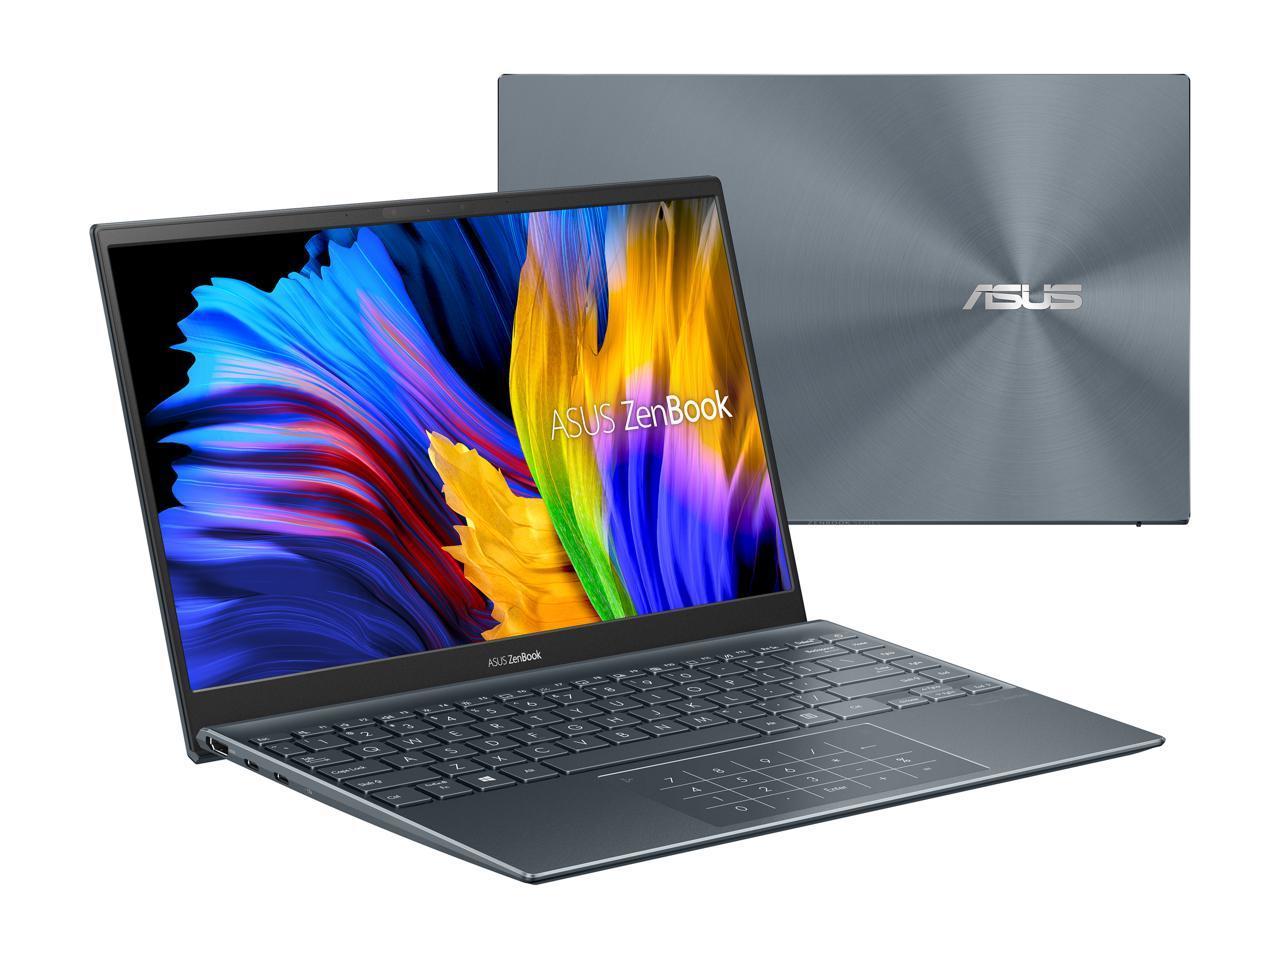 "ASUS ZenBook 14 Ultra-Slim Laptop 14"" Full HD NanoEdge Bezel Display, AMD Ryzen 5 5500U CPU, Radeon Graphics, 8GB RAM, 512GB PCIe SSD $699.99 + Free Shipping at Newegg"